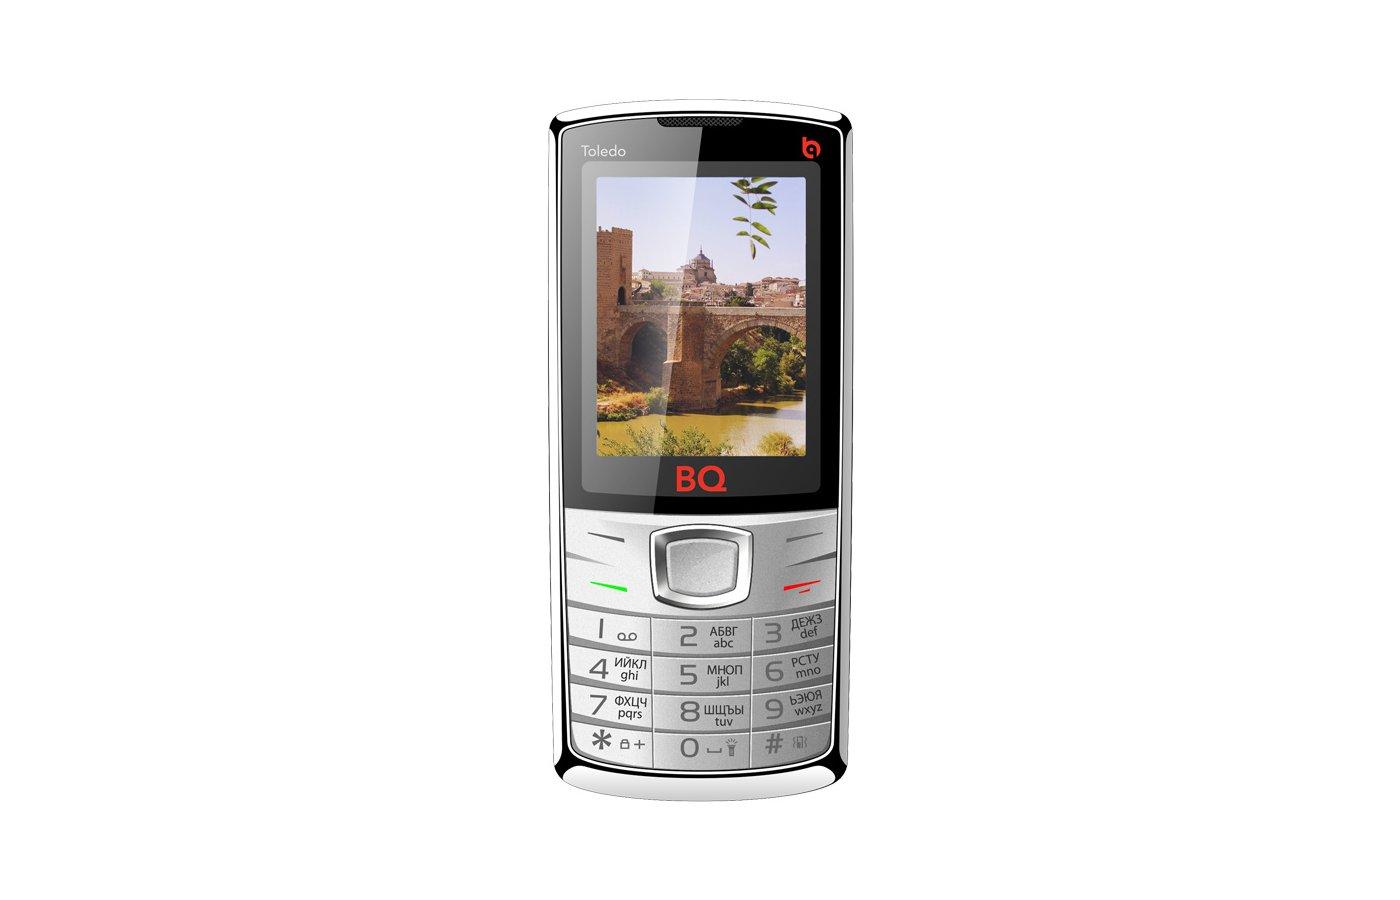 Мобильный телефон BQ BQM-2406 Toledo Silver